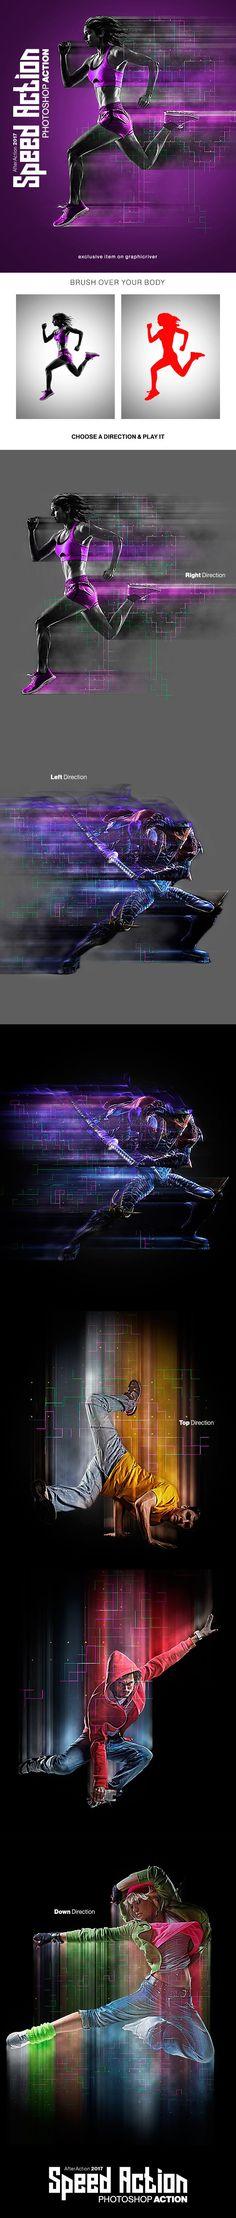 Speed Photoshop Action — Photoshop ATN #photoshop #cinema